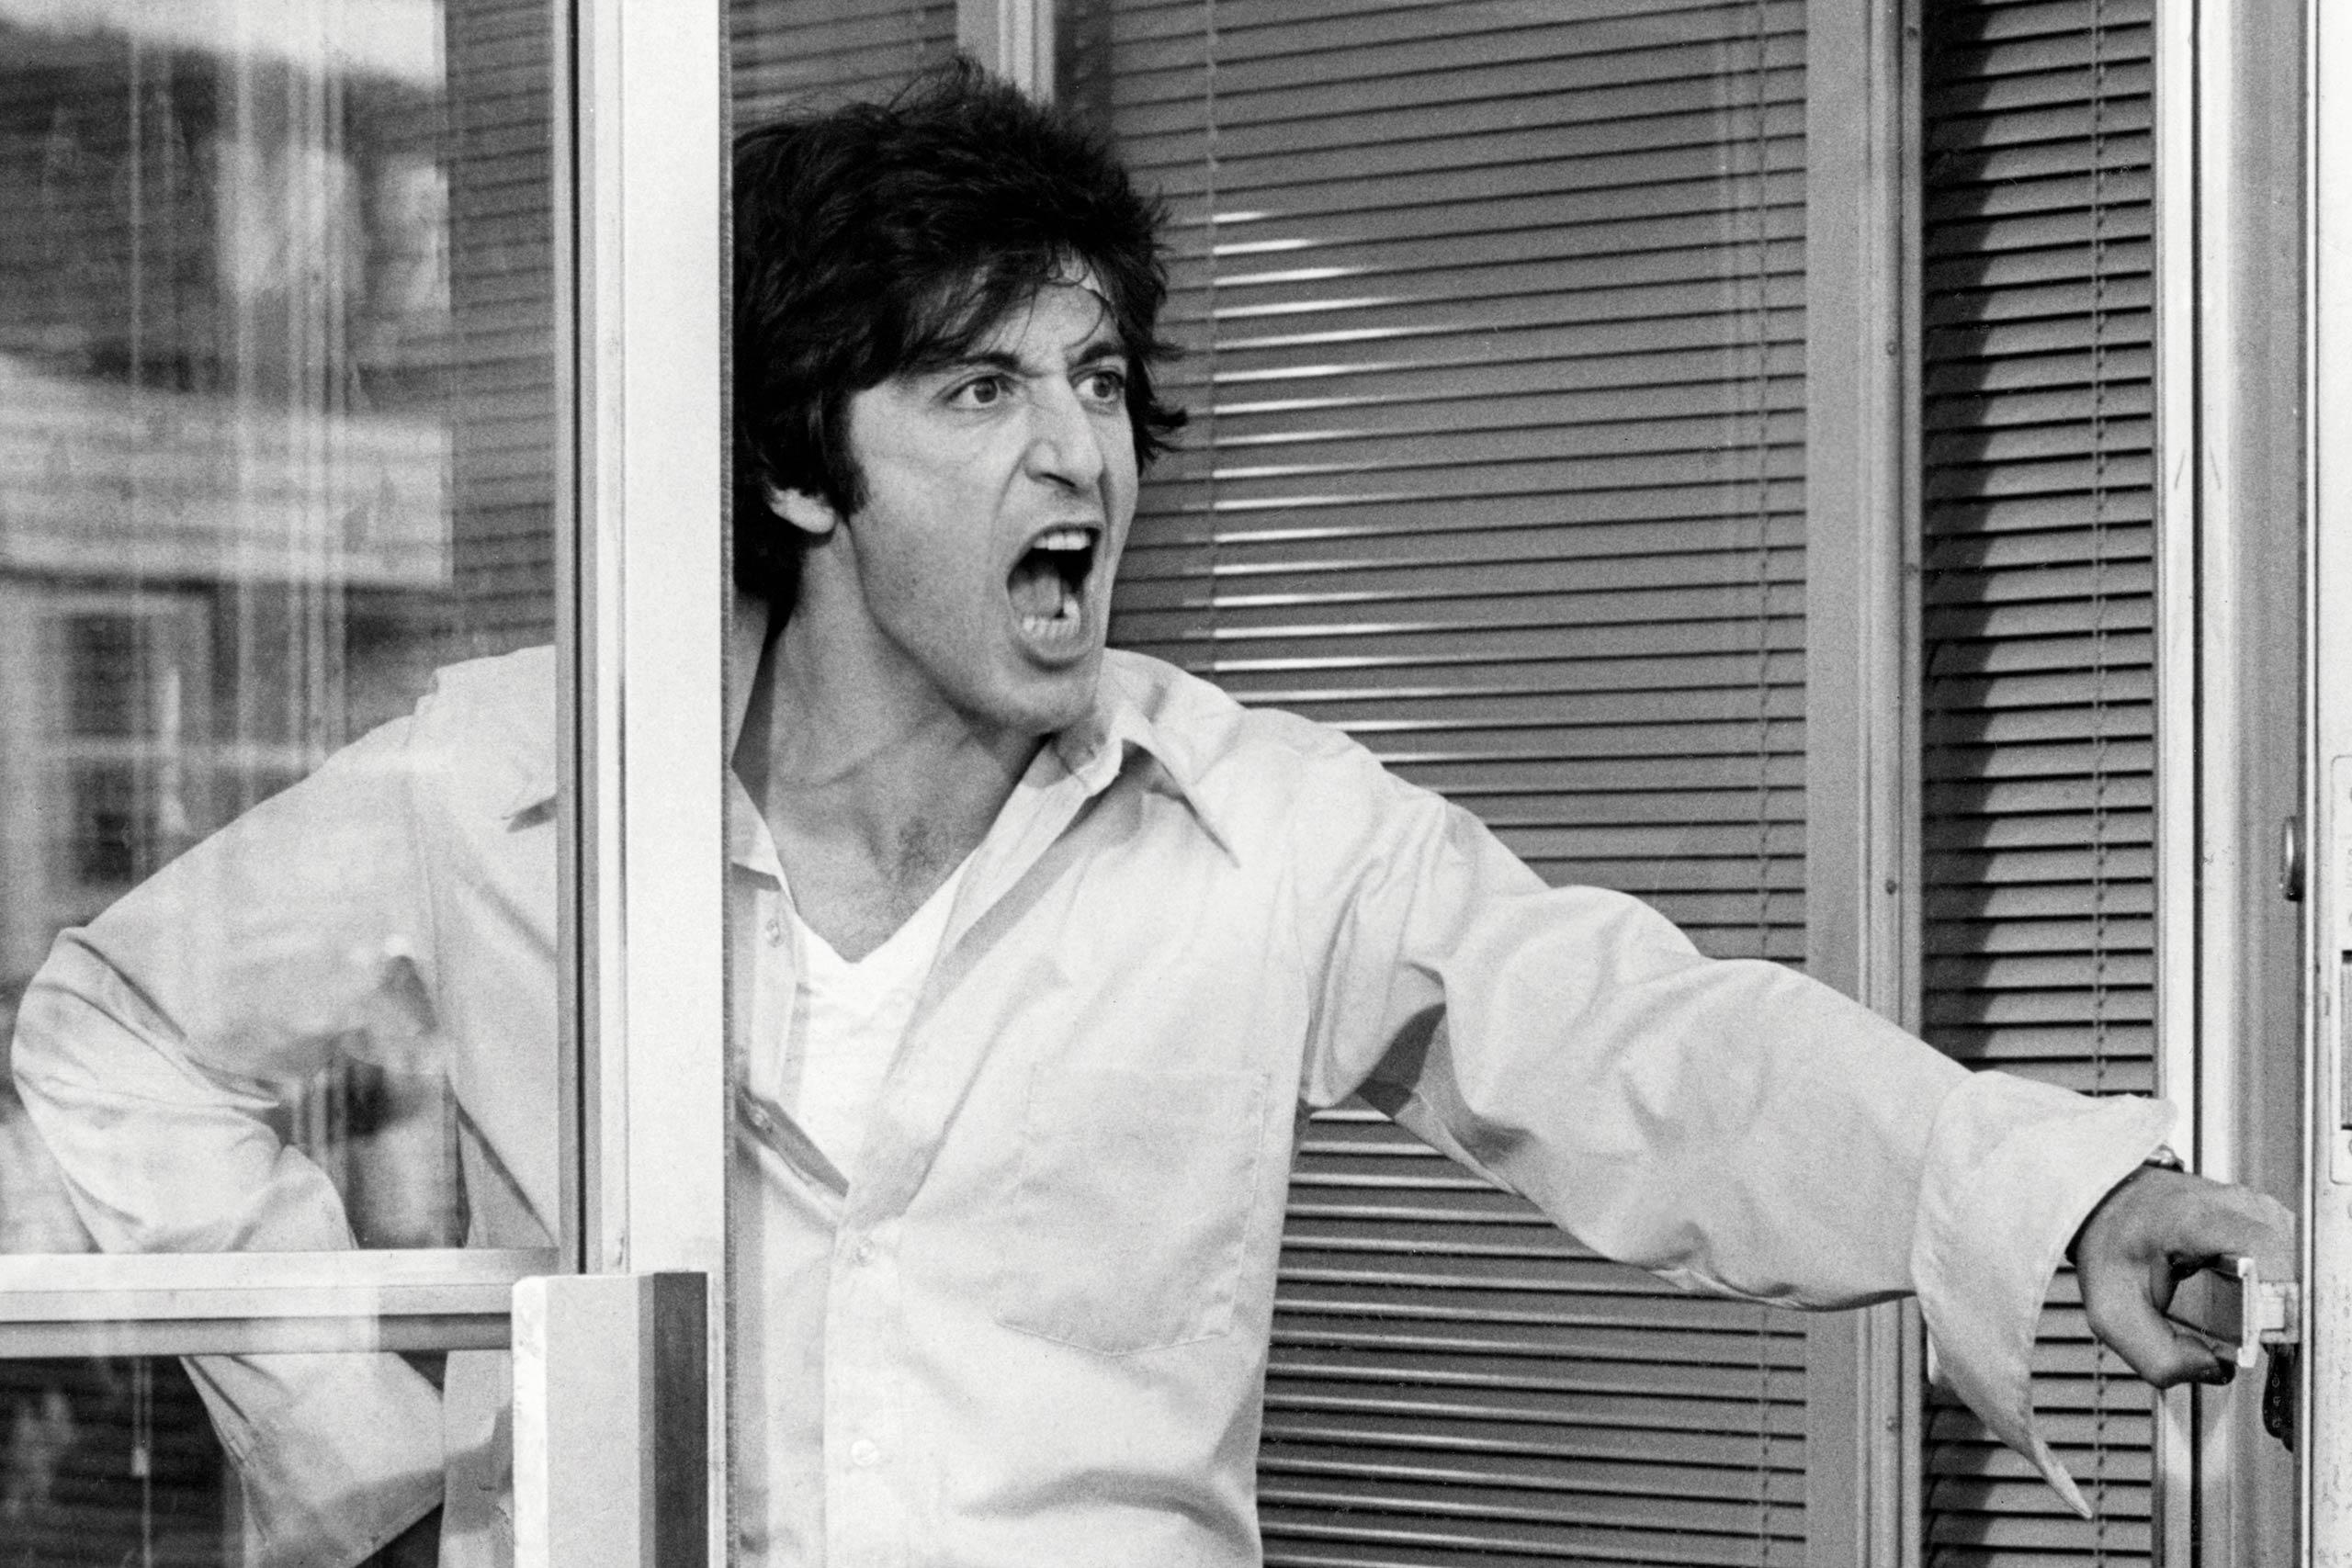 Sonny Wortzik - Dog Day Afternoon, 1975